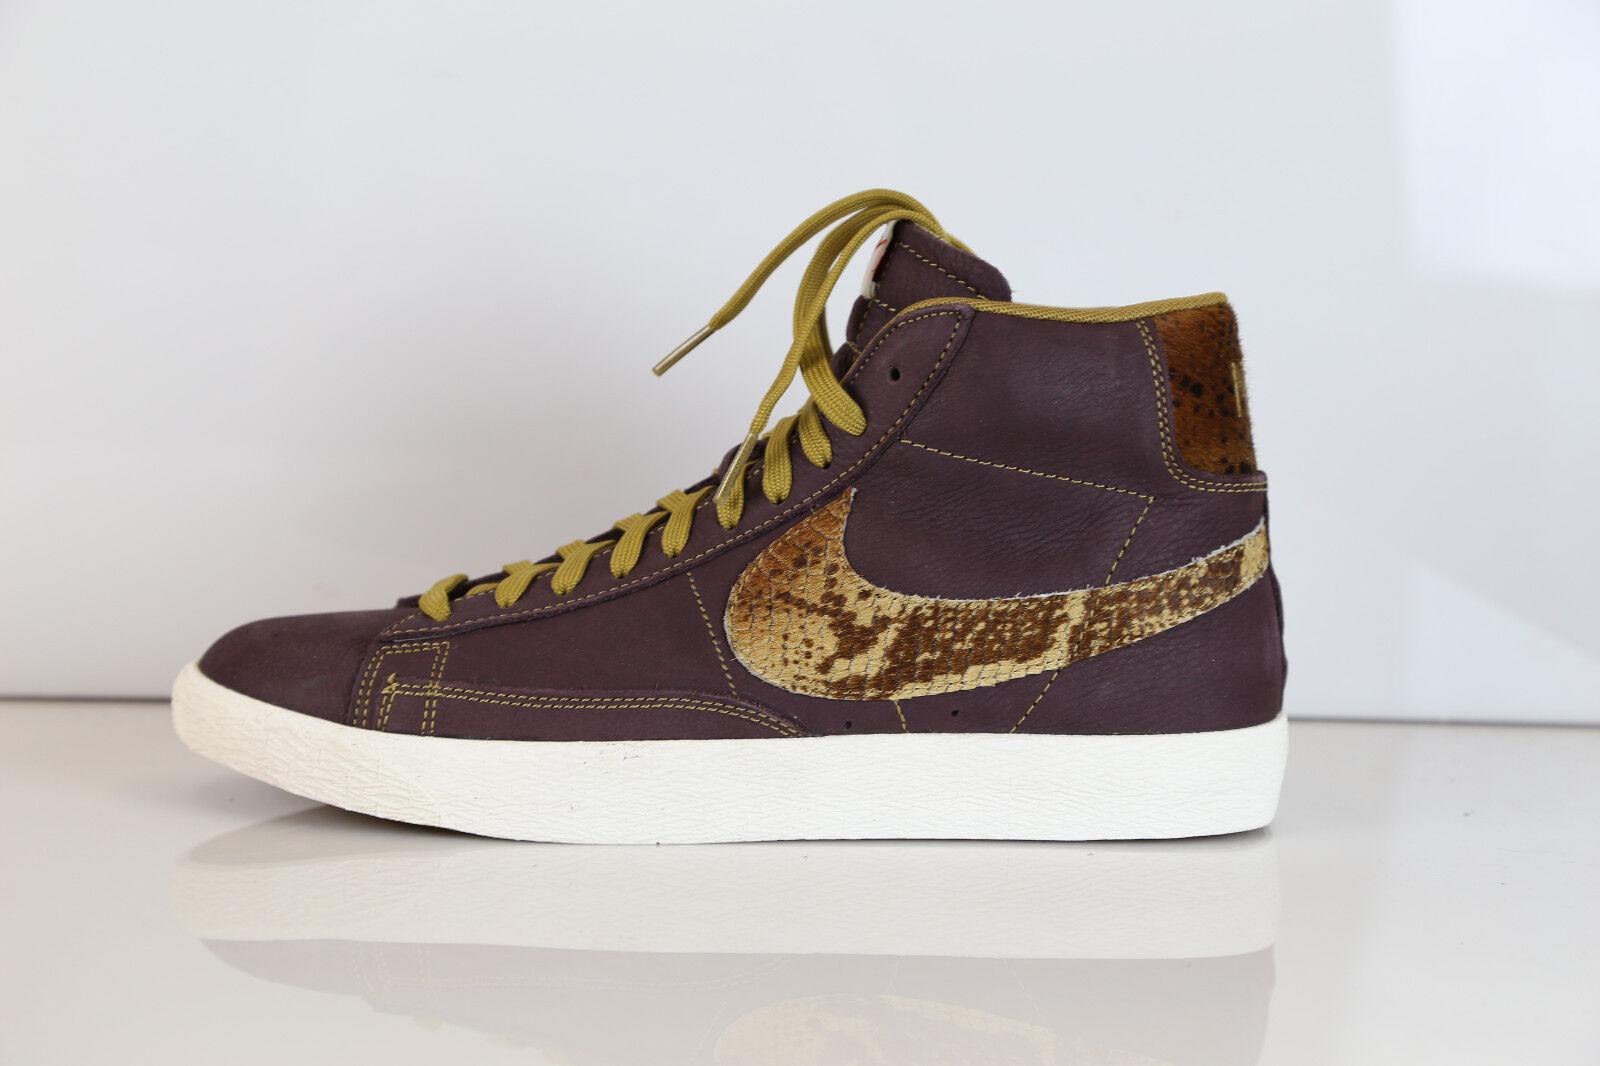 Nike Blazer Mid Premium Vintage VNTG QS Mahogany Sail 638322-animal 8 1